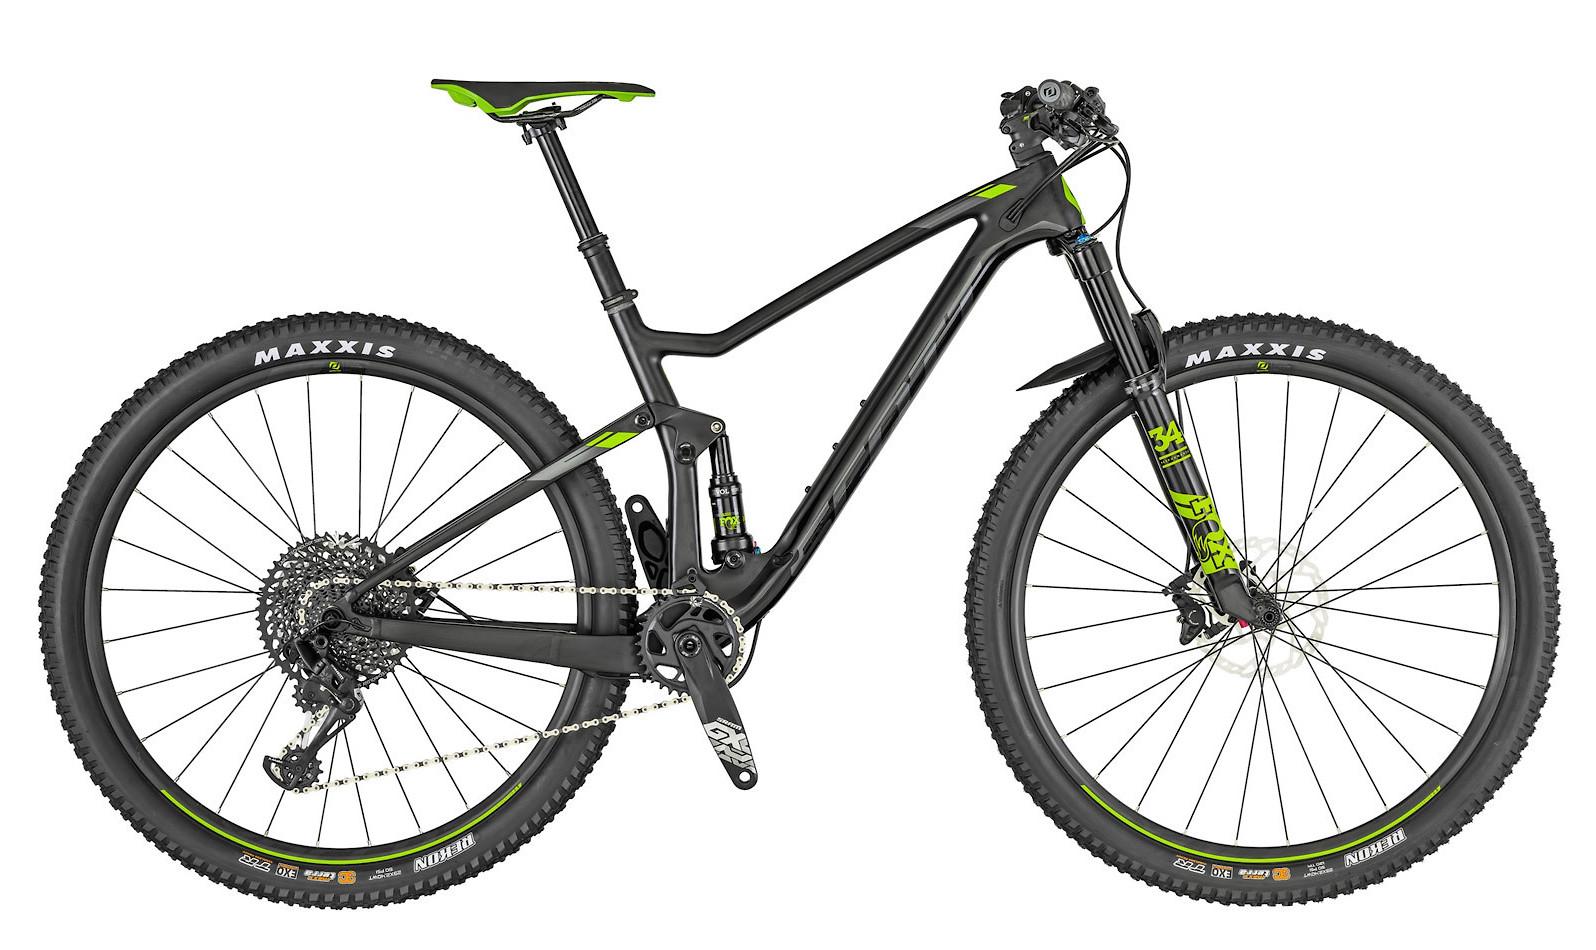 2019 Scott Spark 920 Bike